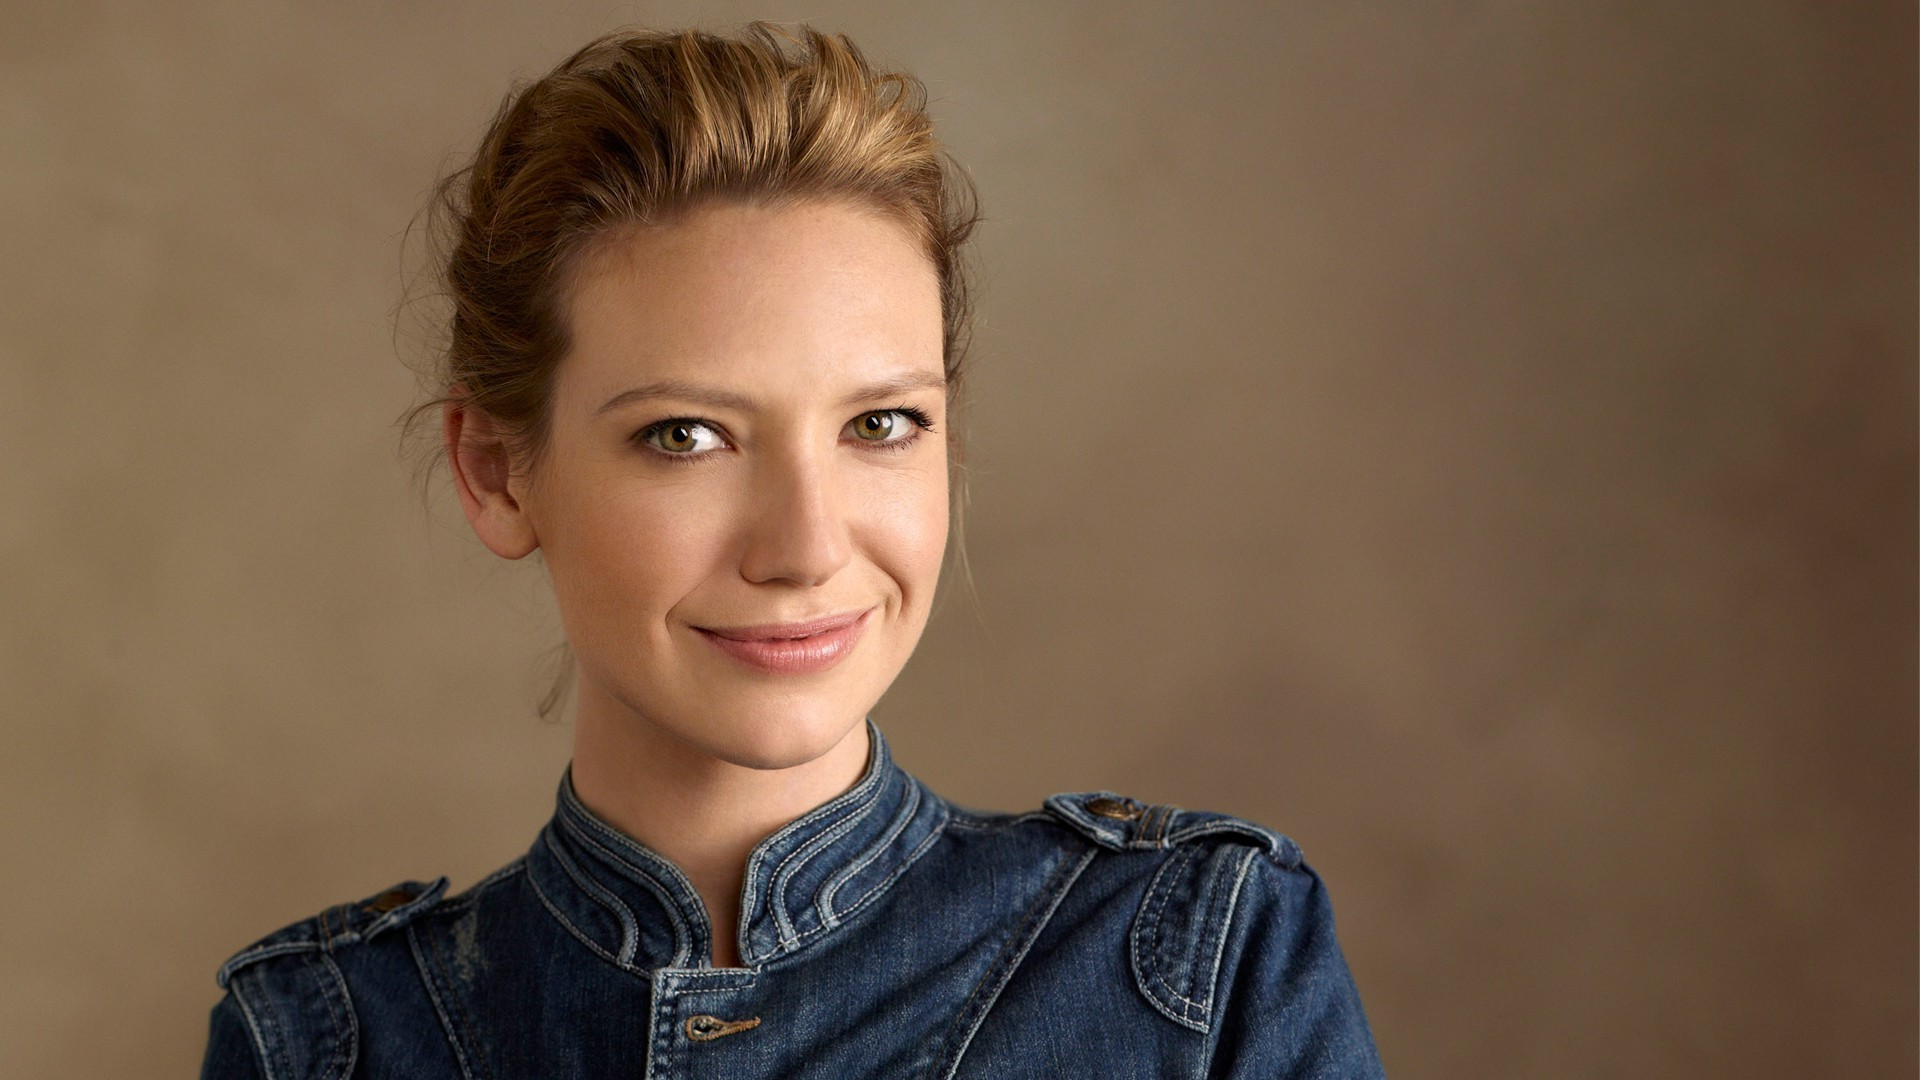 Звезда «Охотника за разумом» и «Грани» сыграет контрабандистку Тесс в сериале по The Last of Us